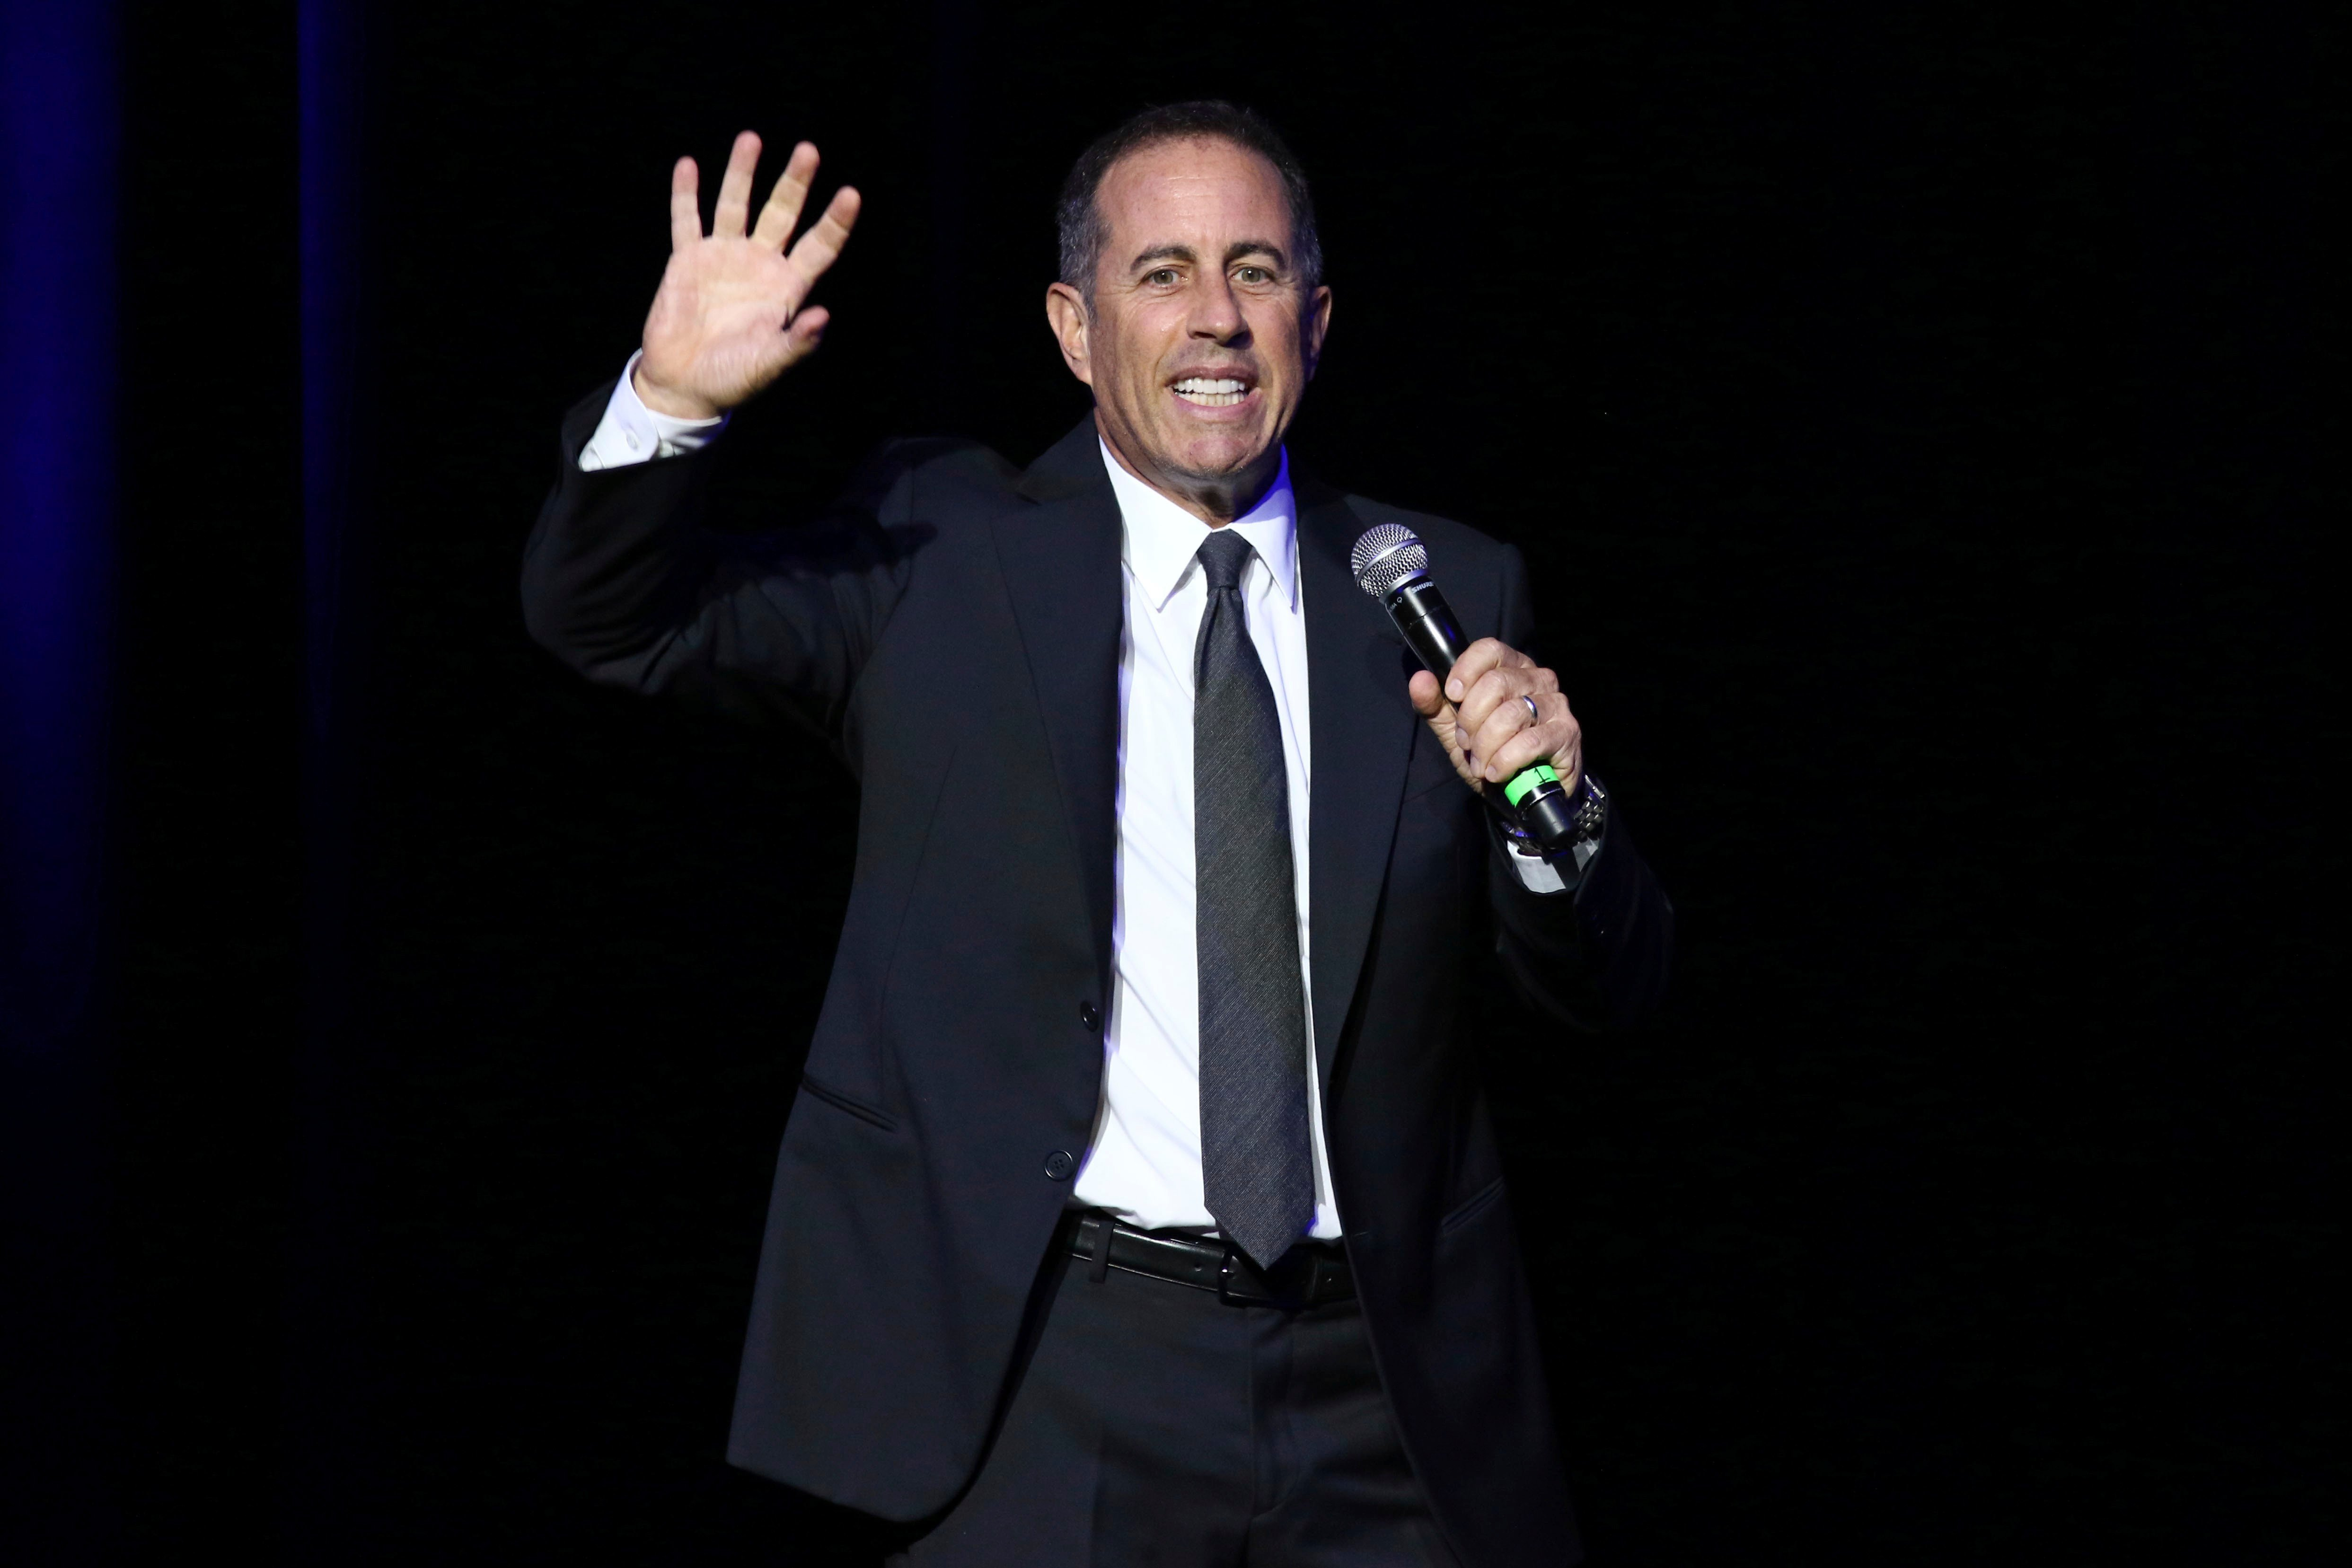 Jerry Seinfeld (Source: Associated Press: Nov. 1, 2016)